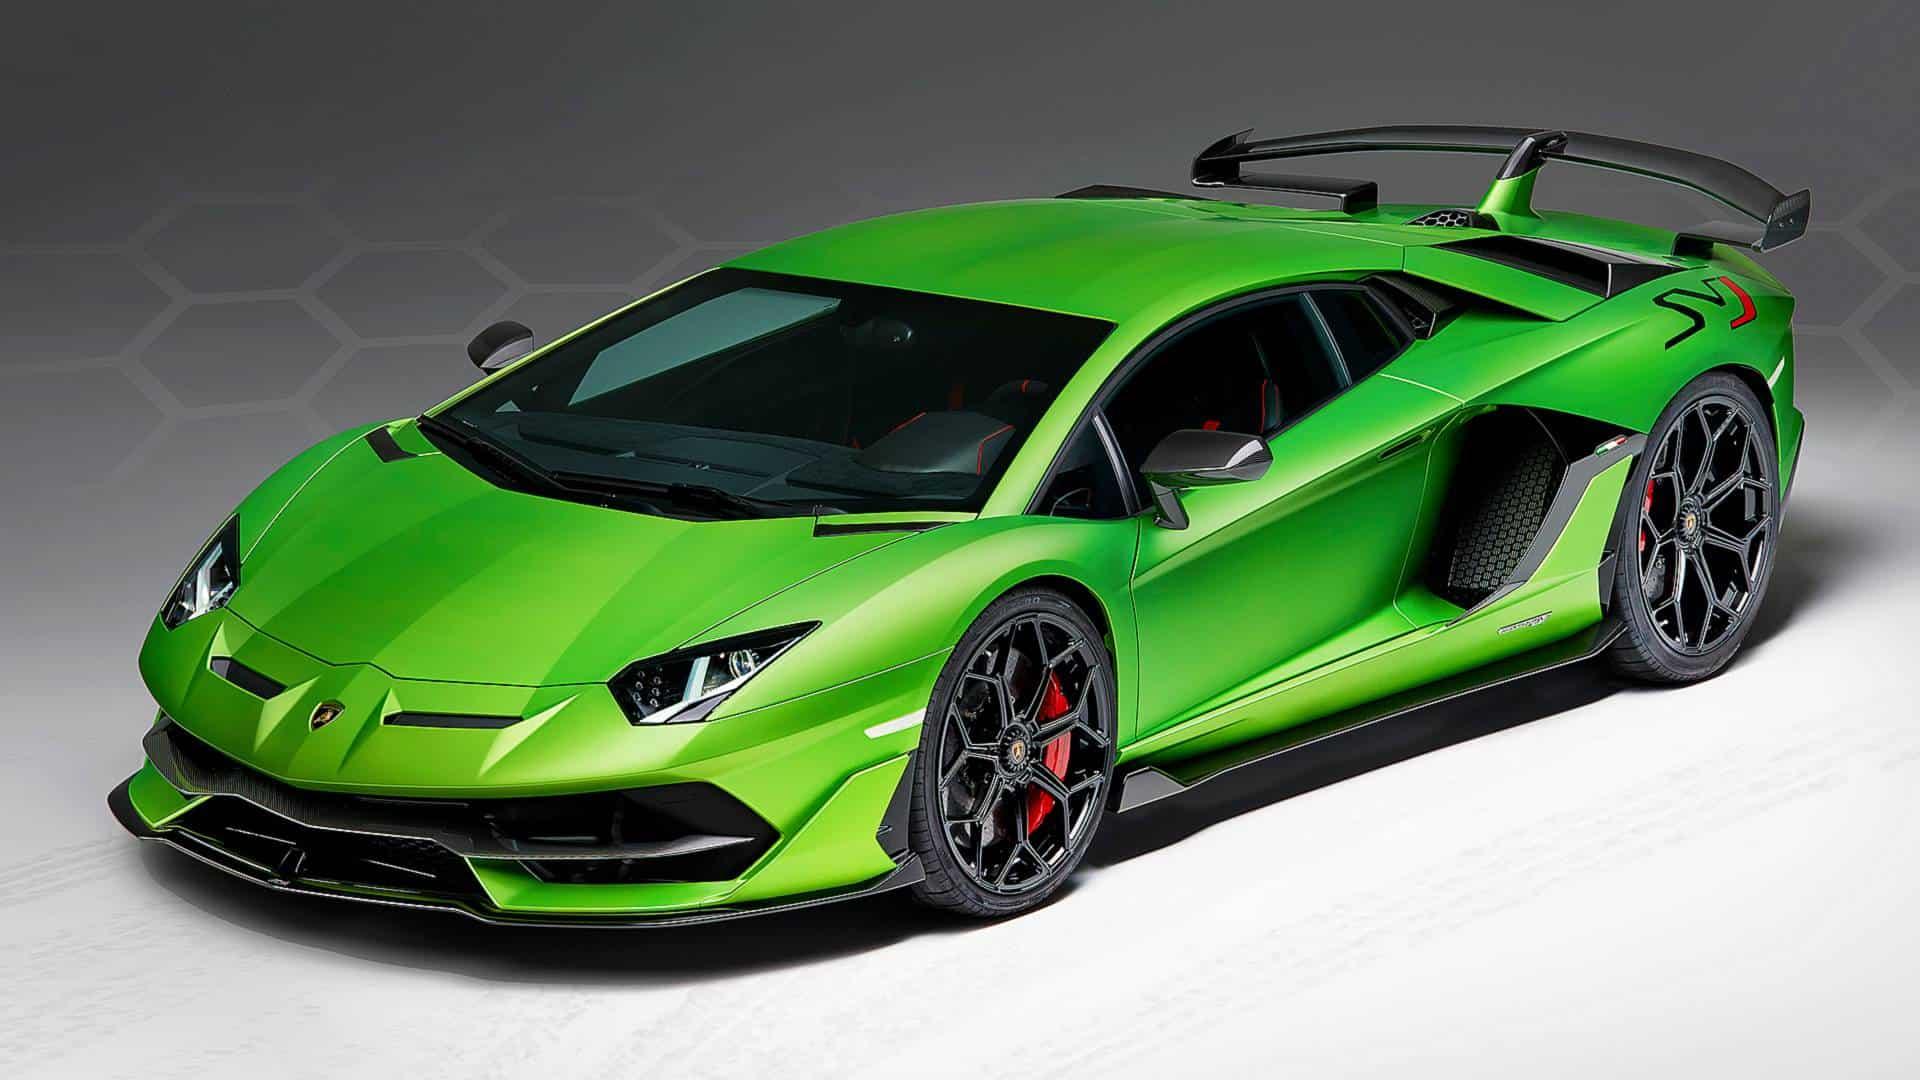 Lamborghini Aventador SVJ. Source: Nastarta